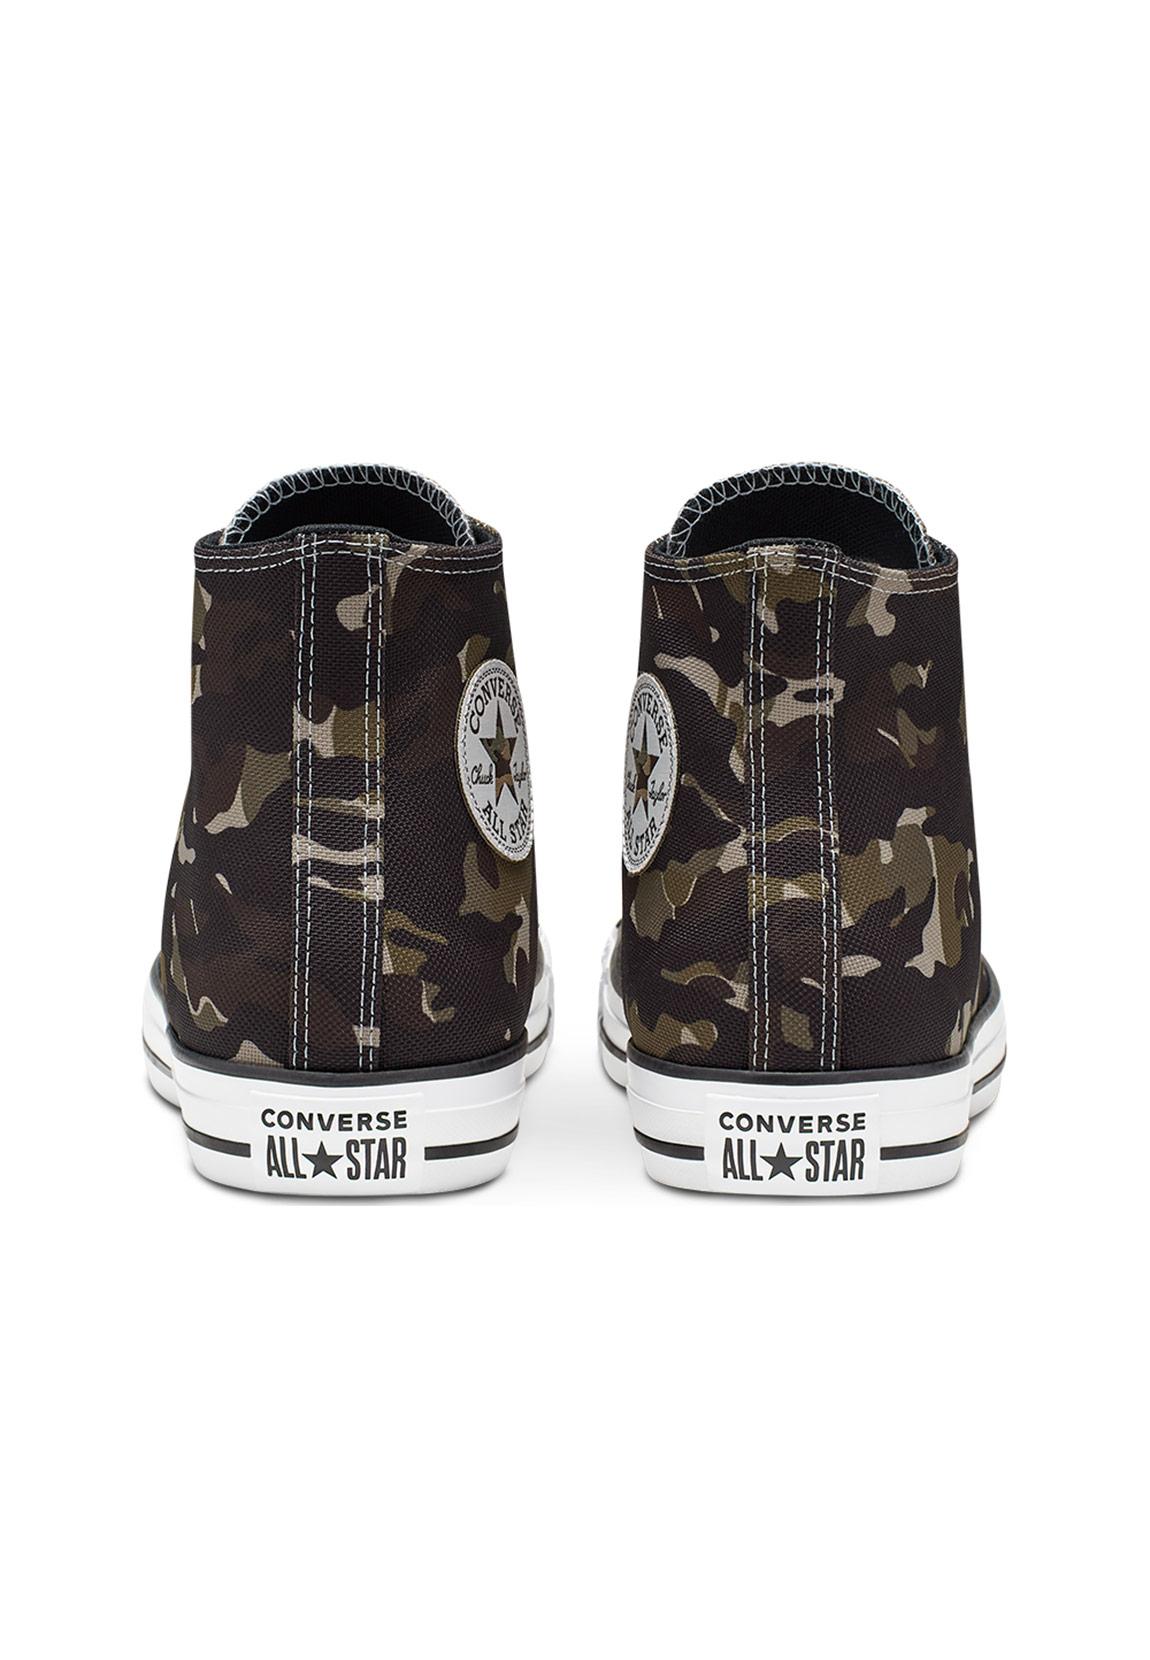 Converse Chucks CTAS HI 165915C Camouflage